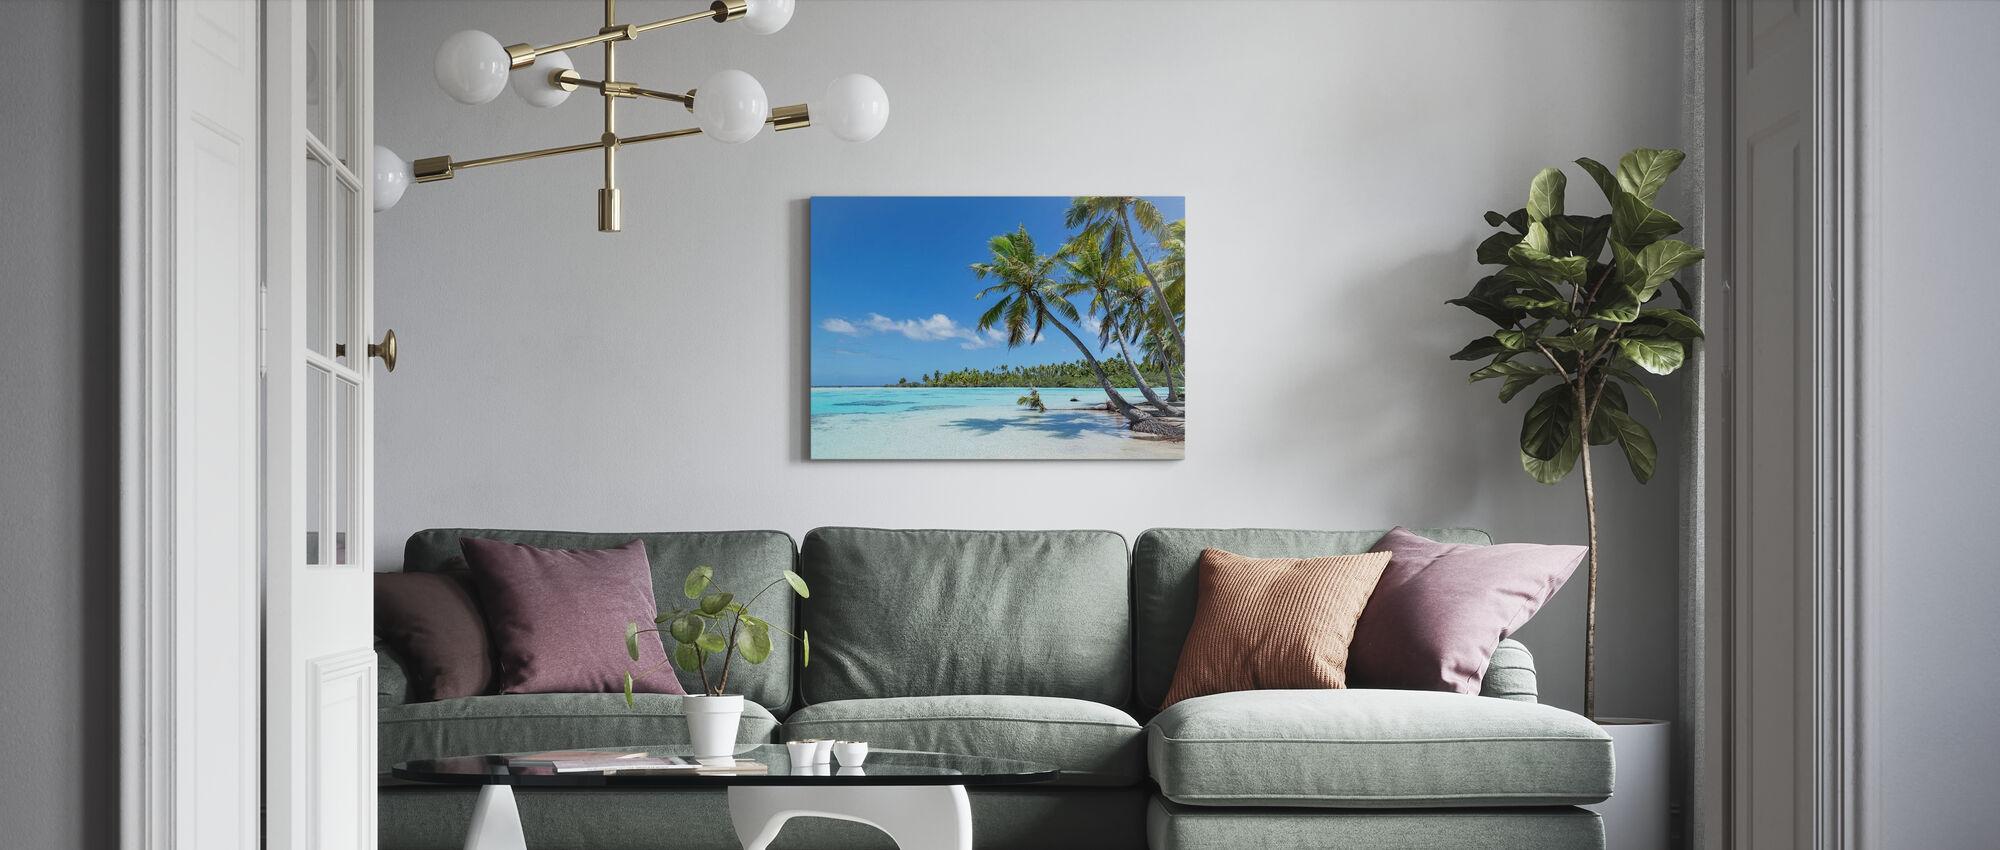 Teahatea Fakarava France - Canvas print - Living Room